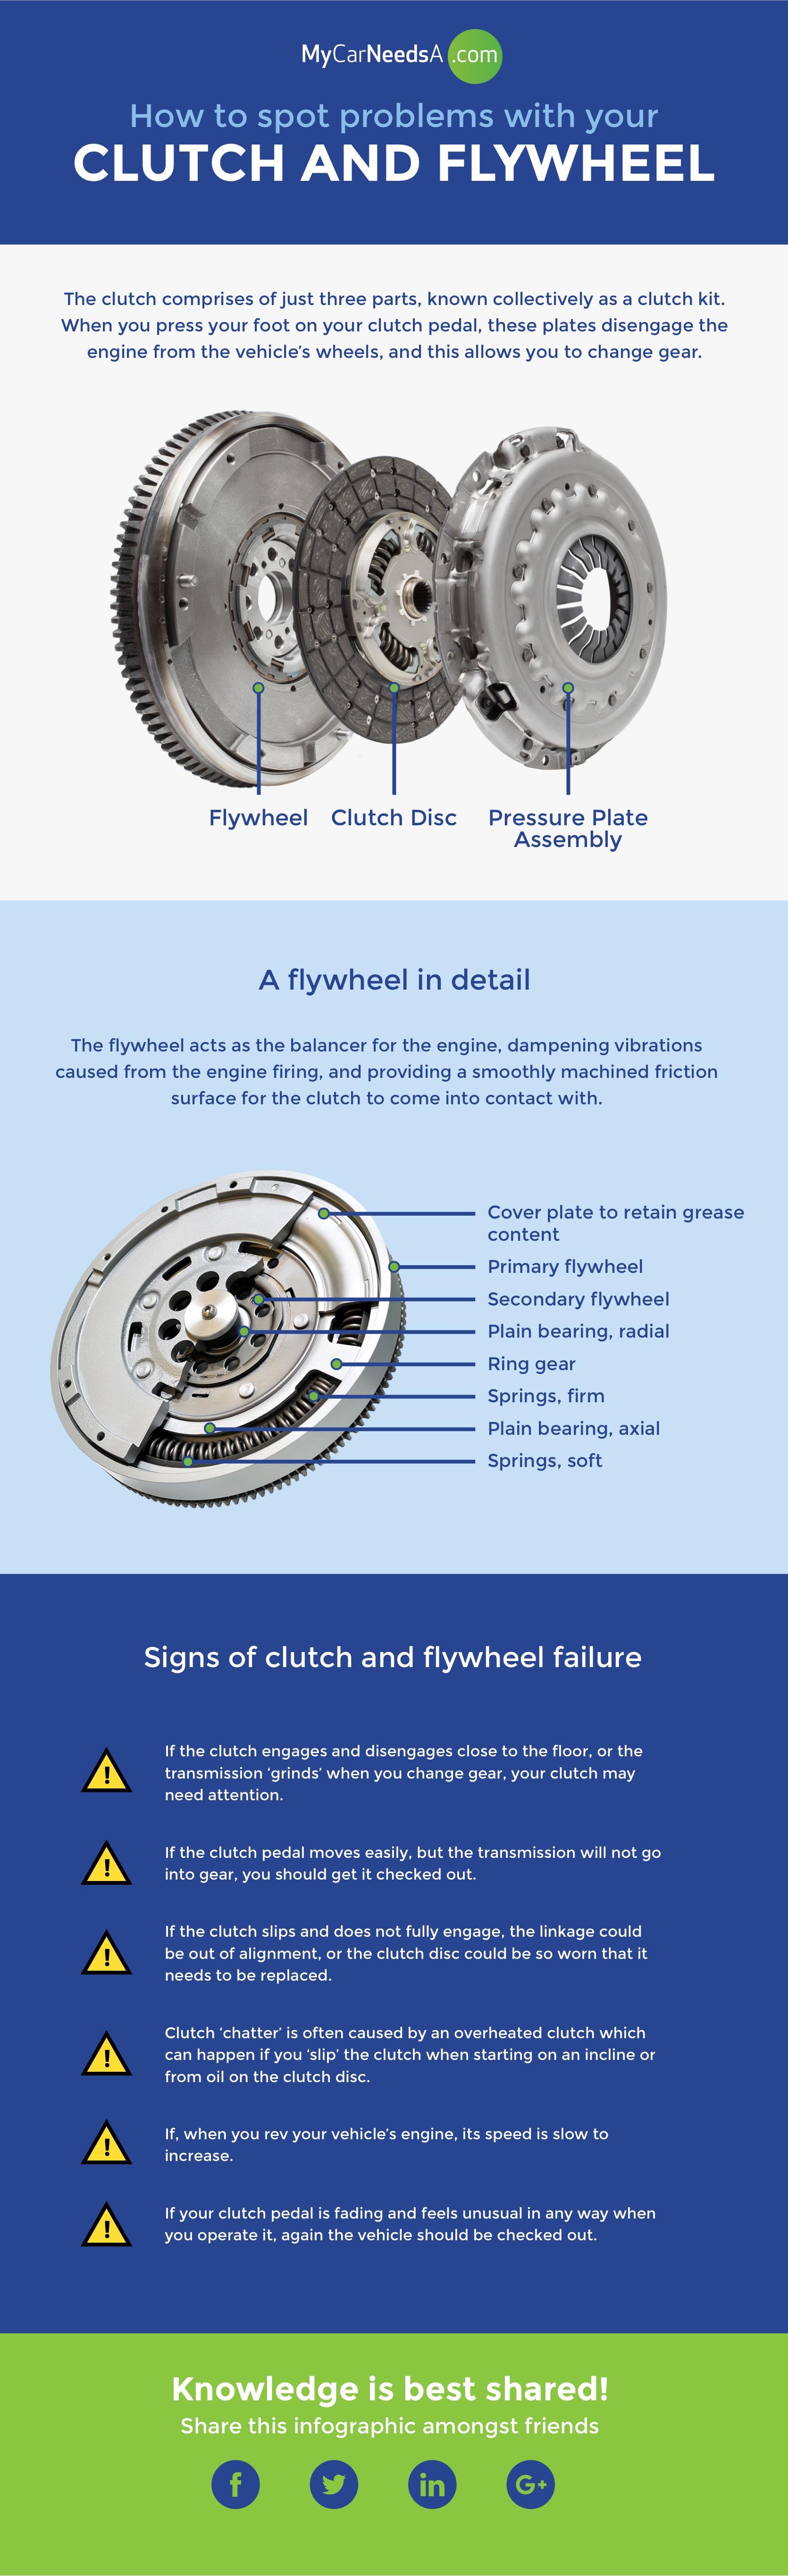 Clutch and Flywheel